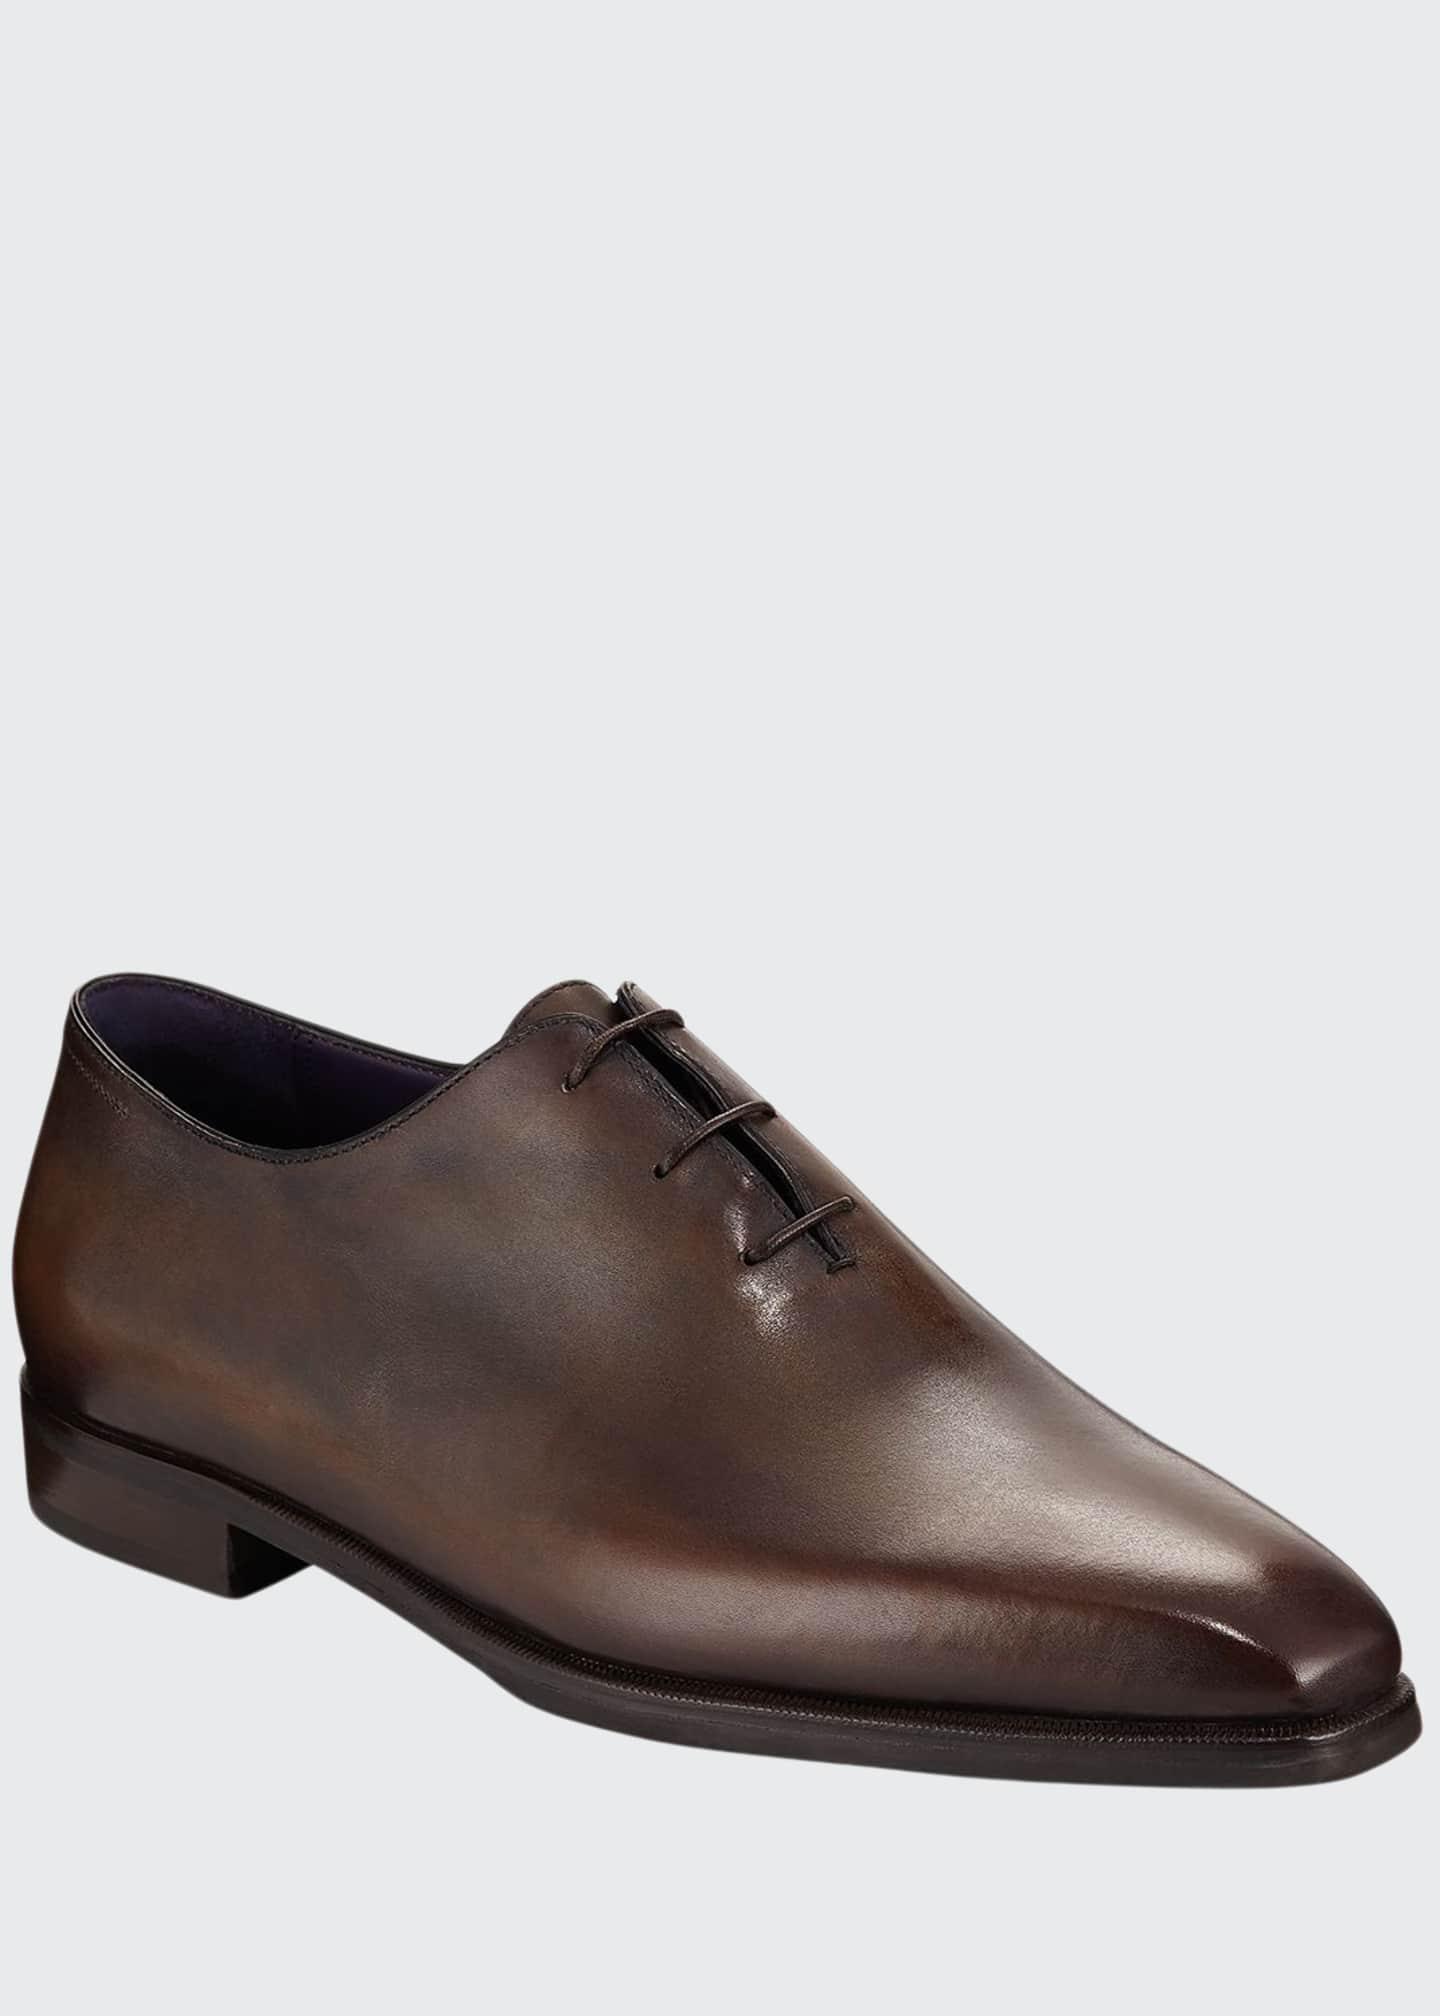 Berluti Alessandro Demesure Leather Oxfords with Leather Sole